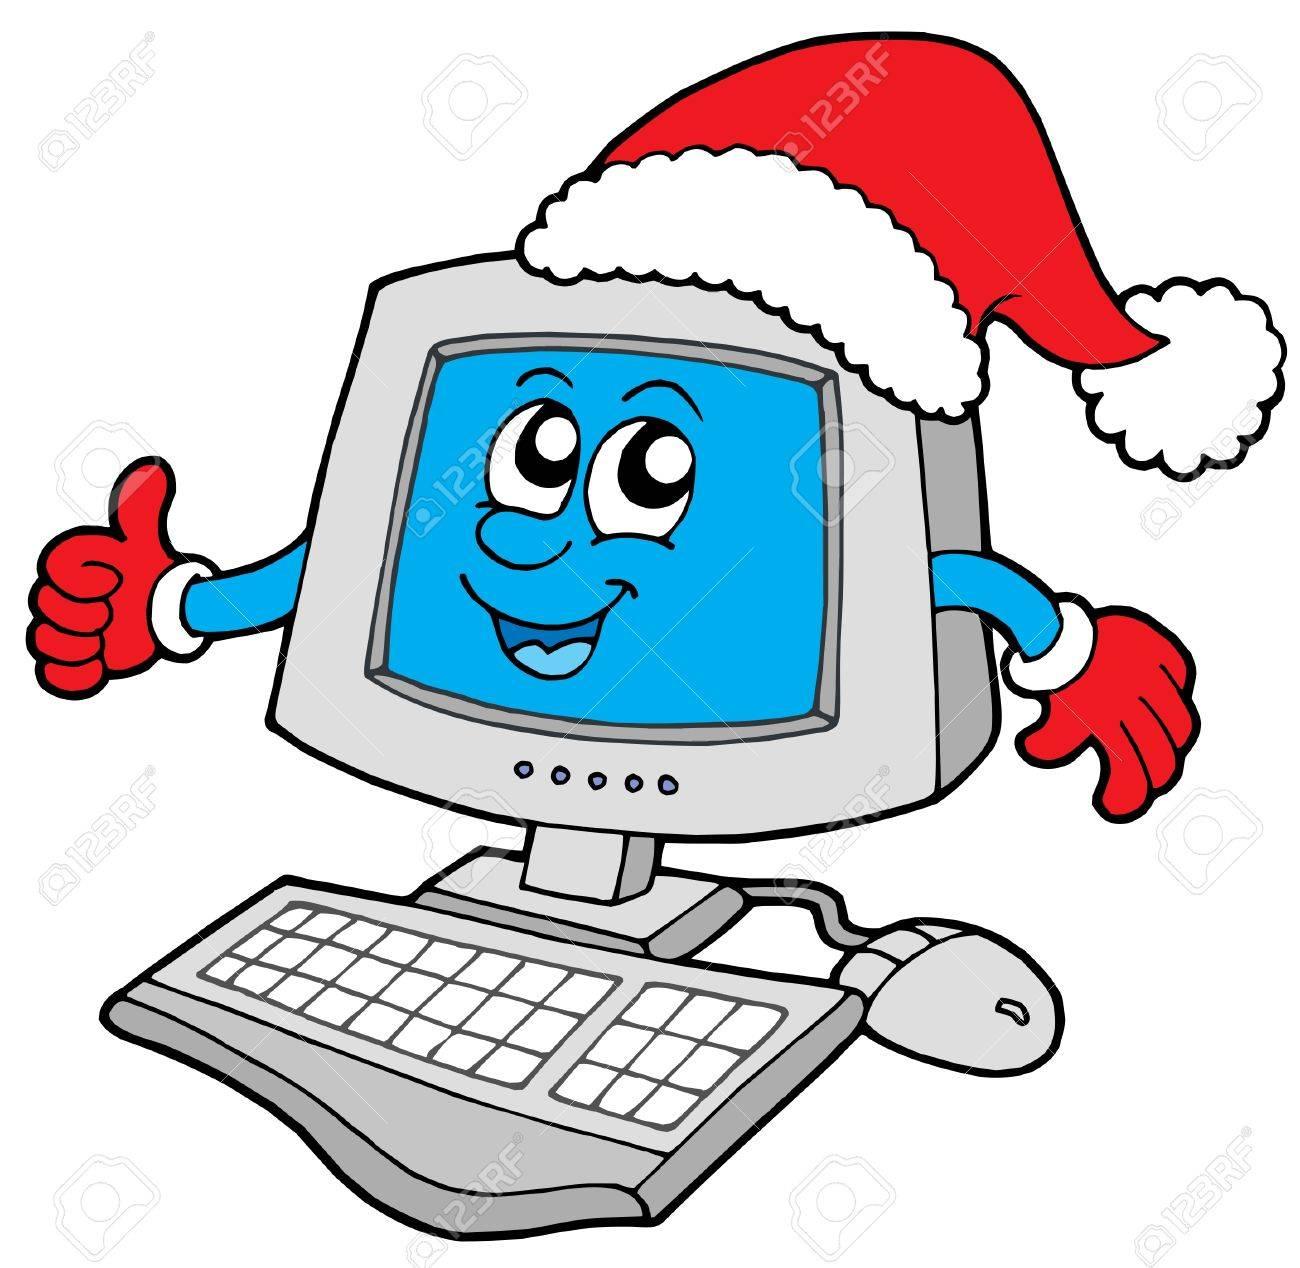 Christmas smiling computer - vector illustration. Stock Vector - 3853037